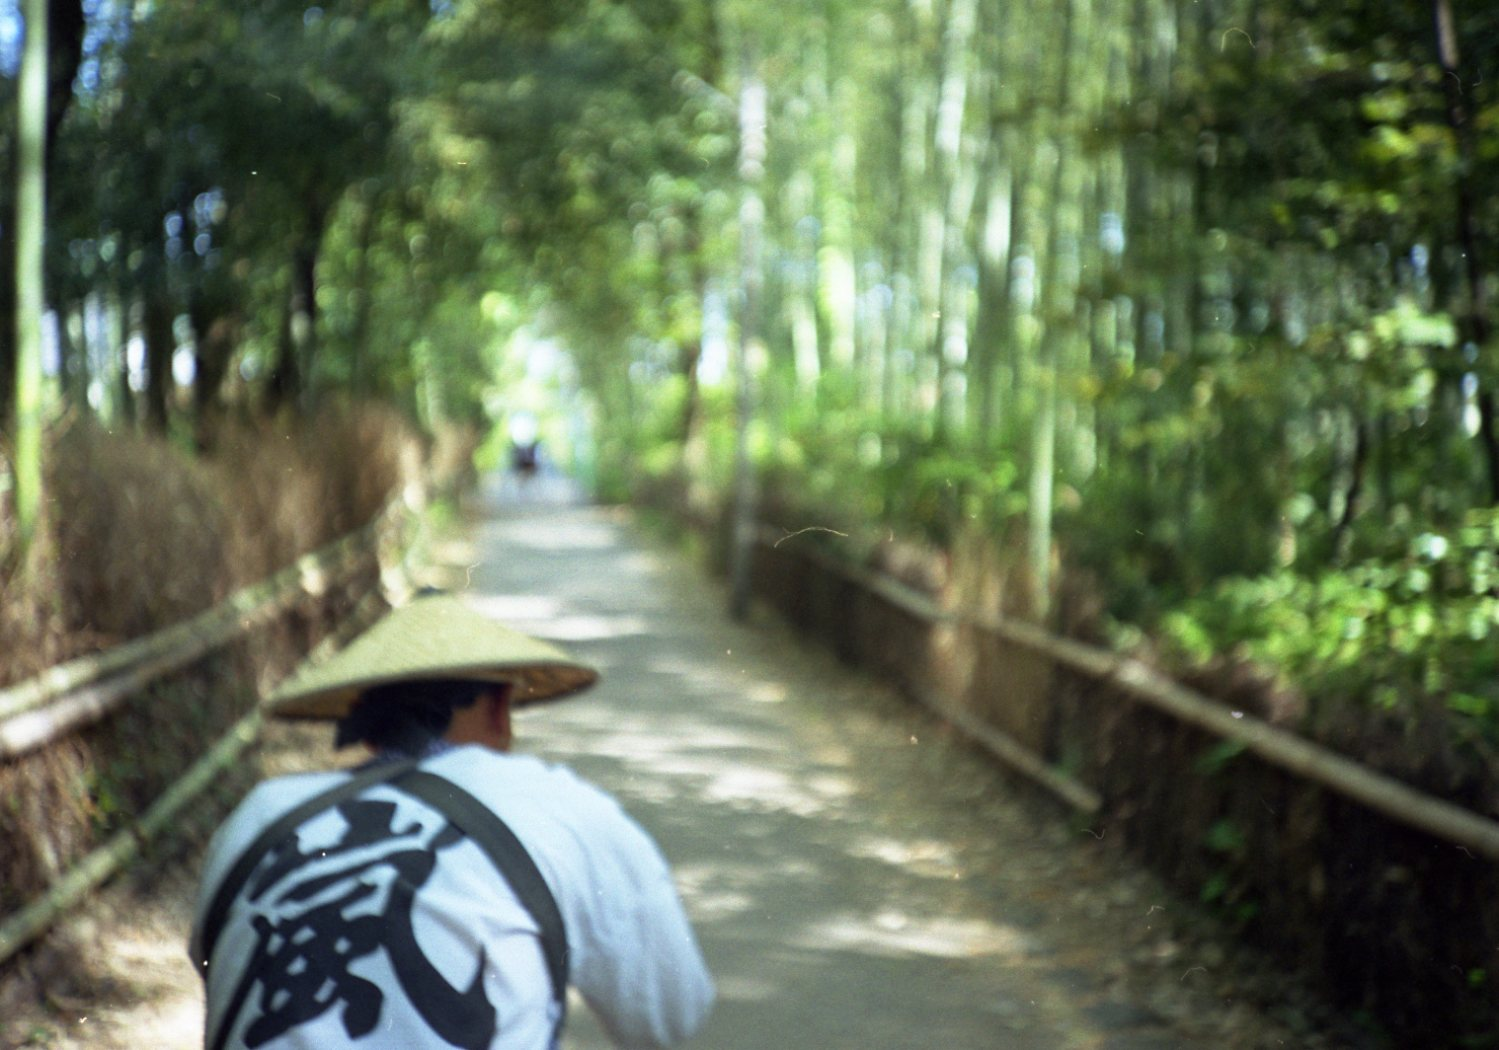 LOMO with AGFA ULTRA in 嵐山